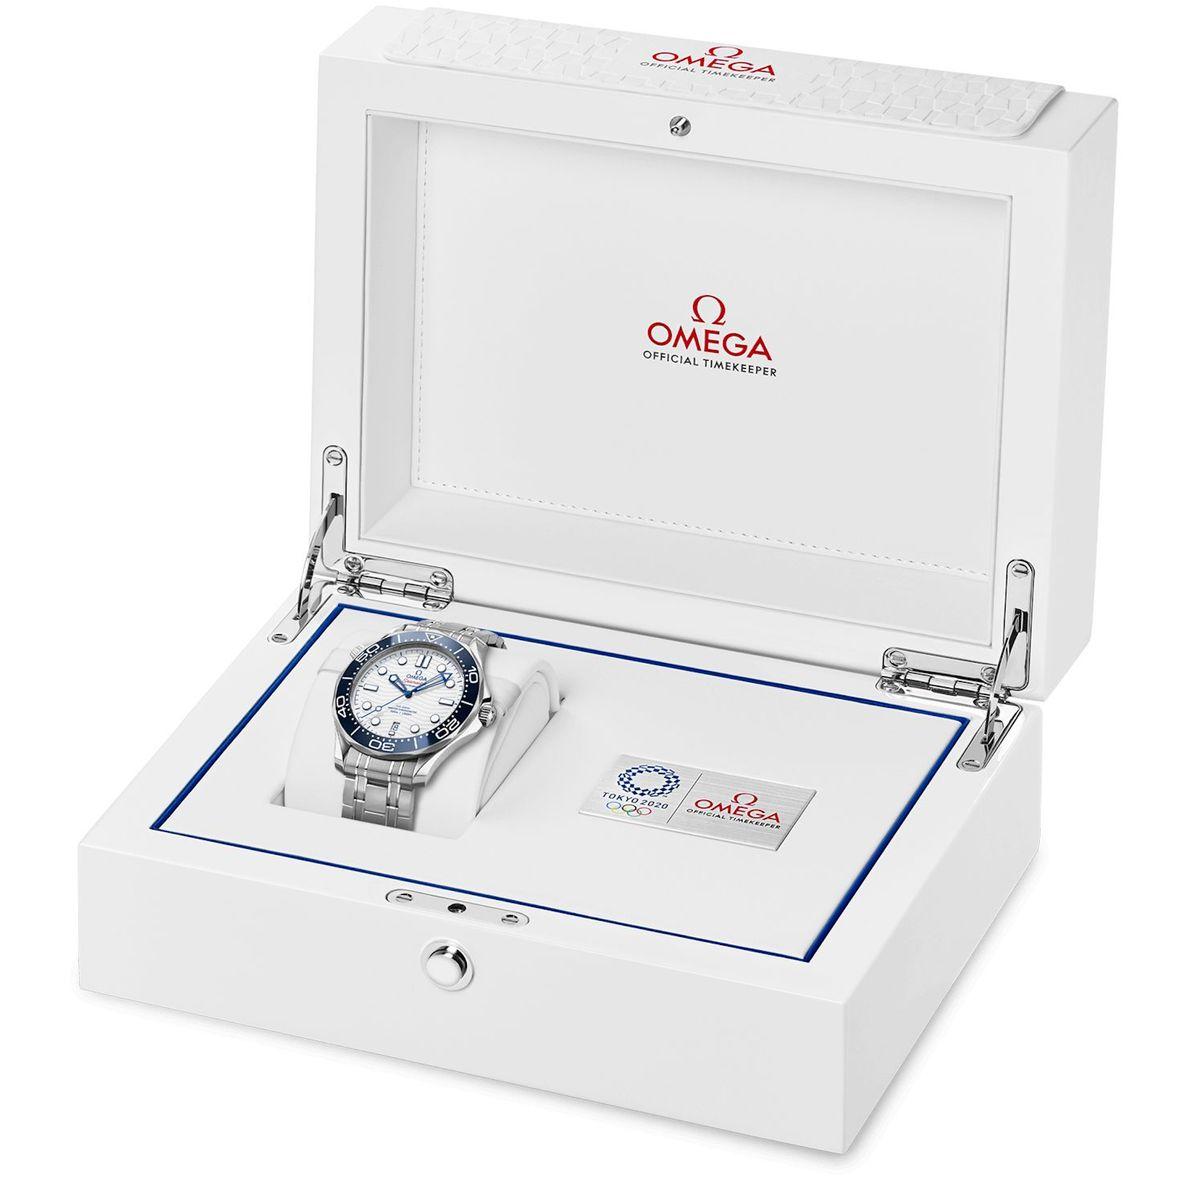 Omega Seamaster Tokyo 2020 Edition Diver 300M Olympics Presentation Box